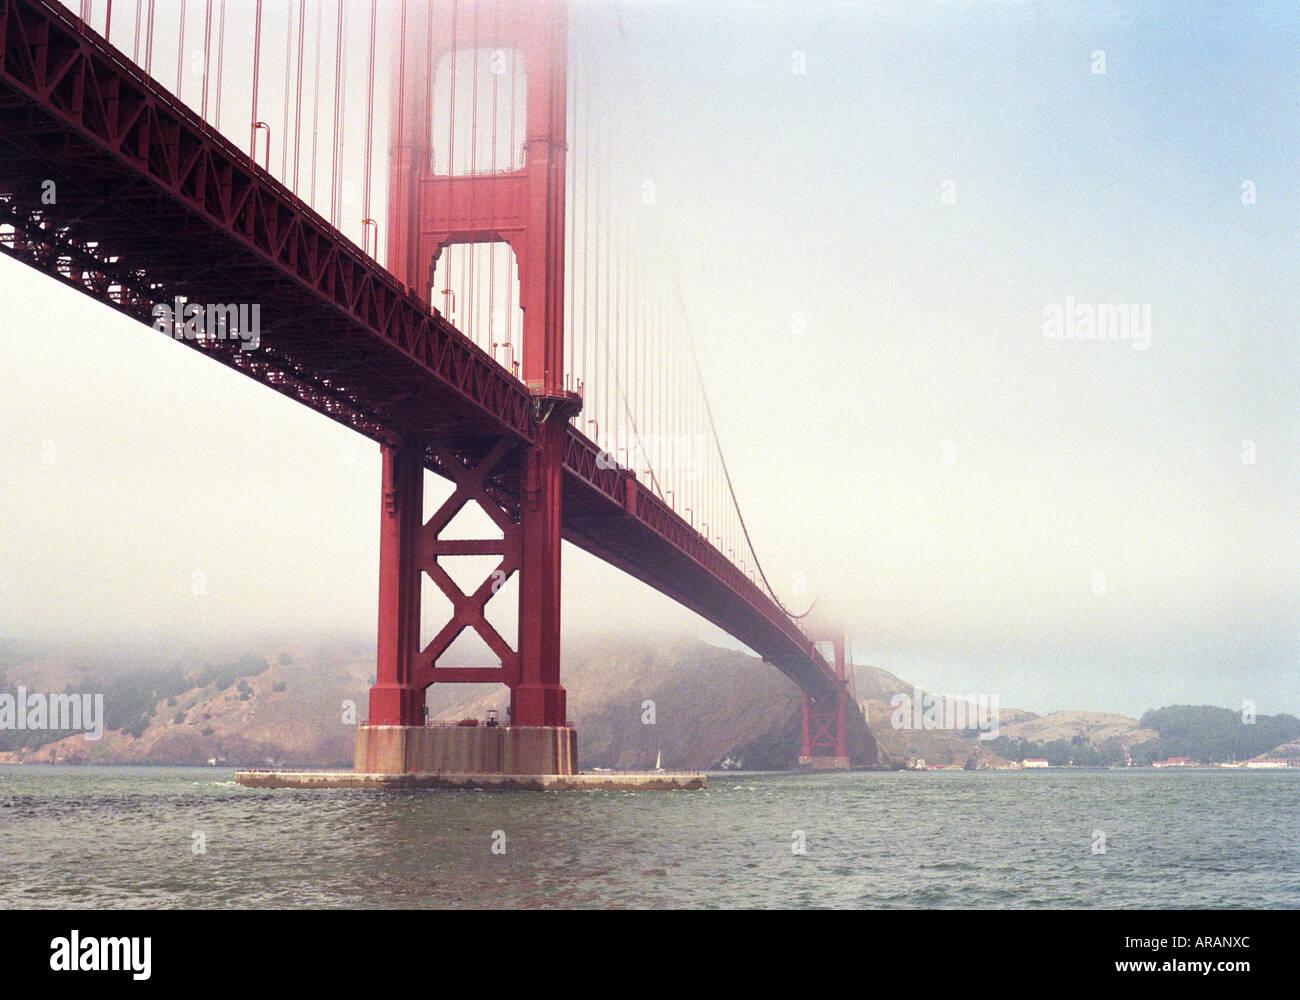 Golden Gate Bridge in San Francisco California - Stock Image